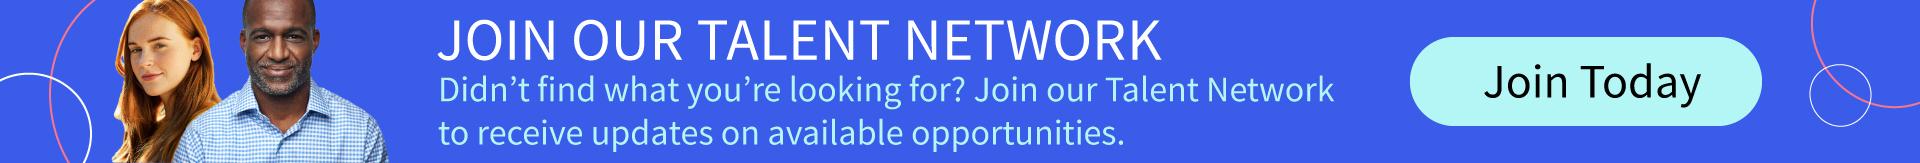 bottom-main-join-talent-network-banner-new-brand